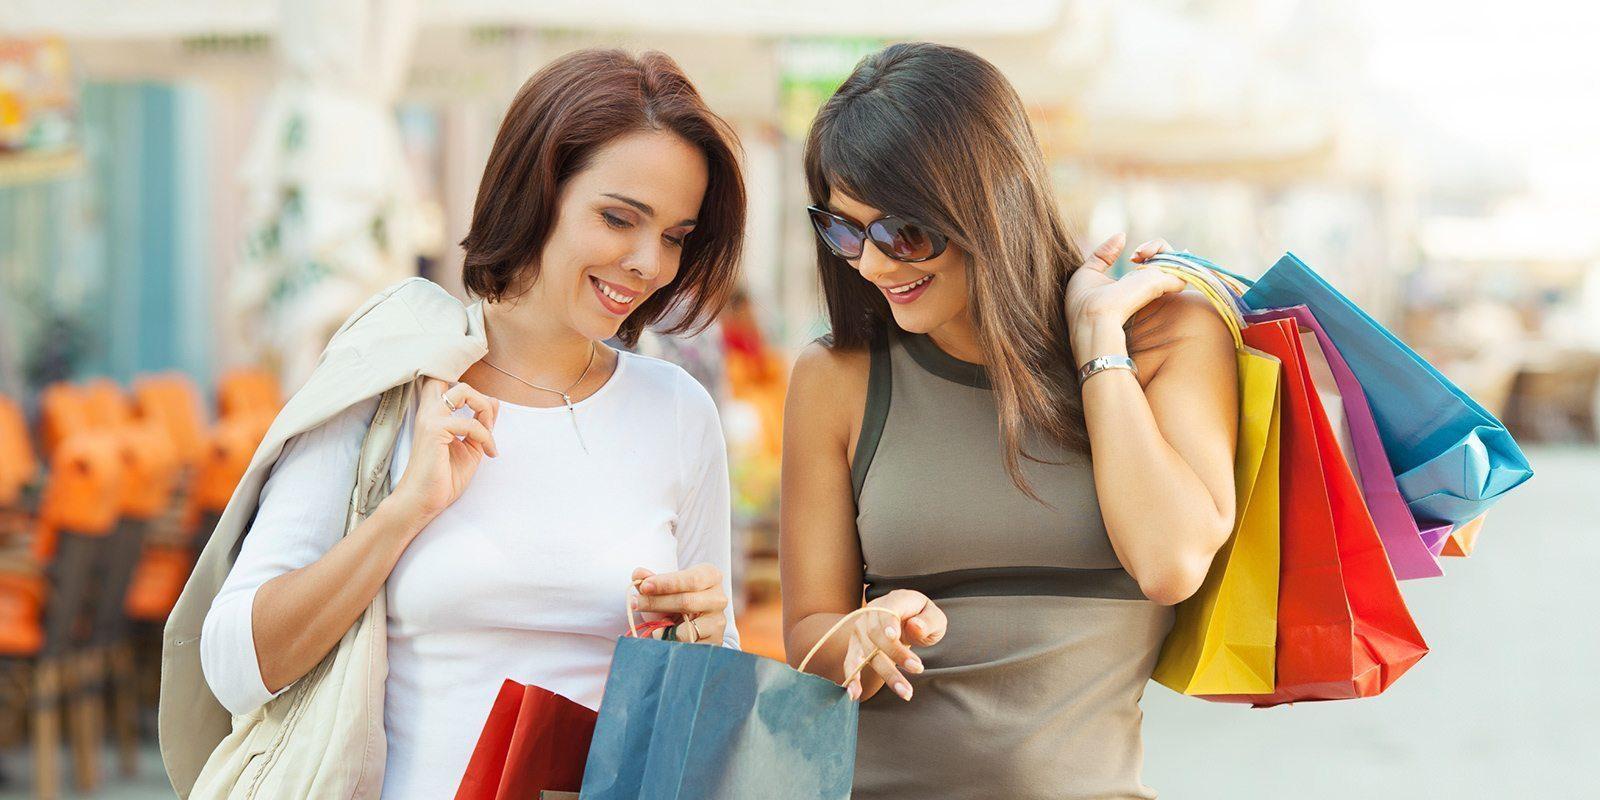 shopping-banner-1